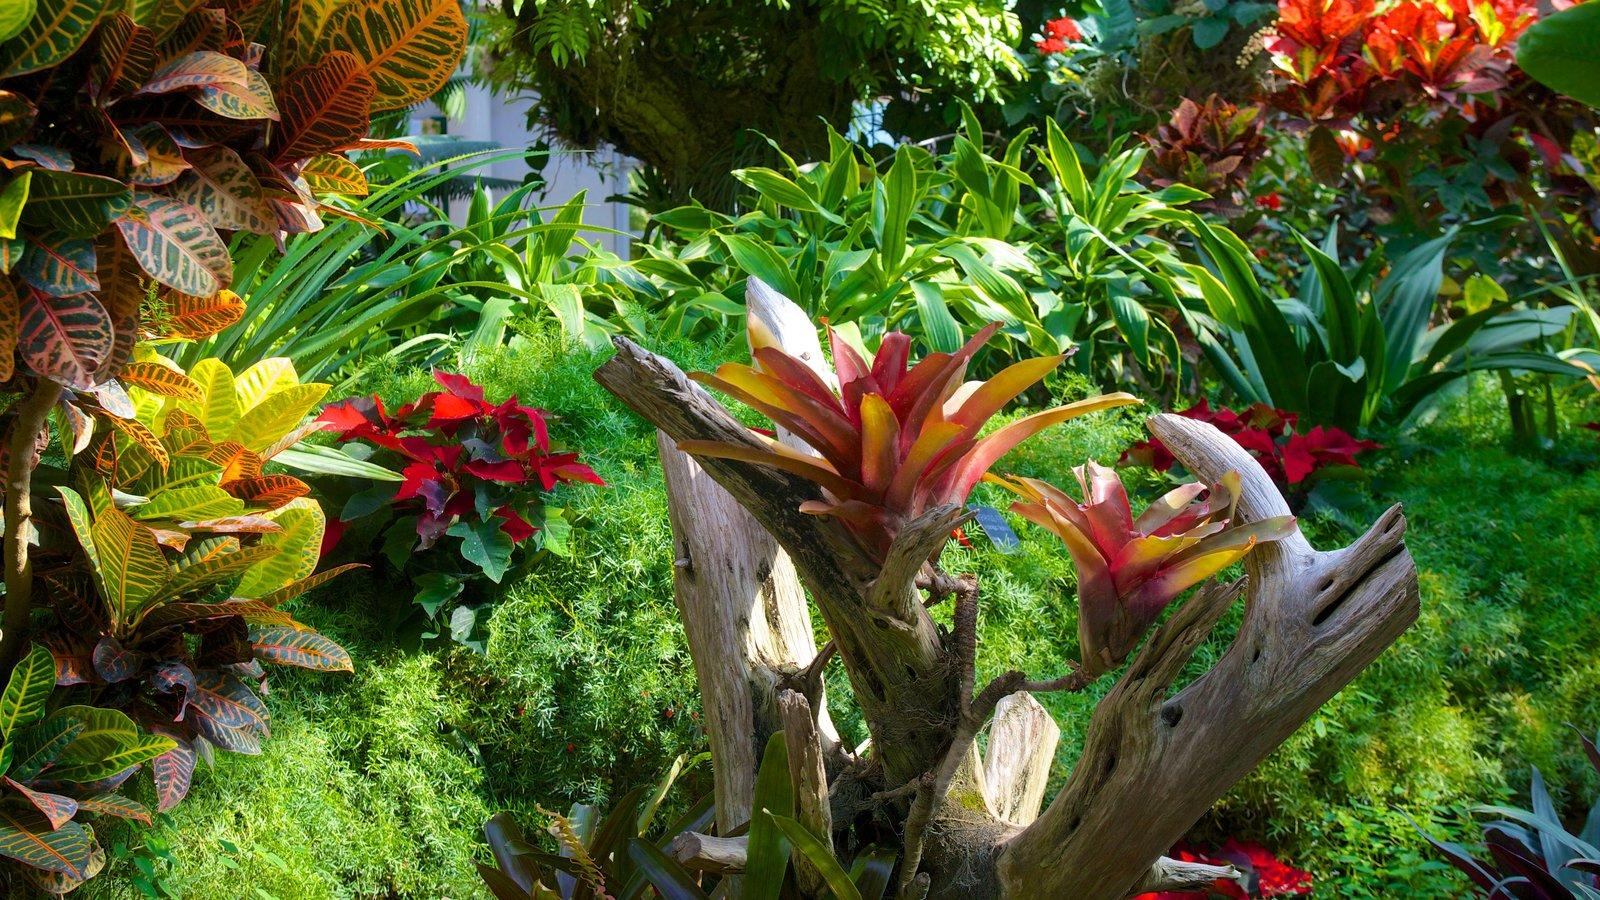 San Antonio Botanical Gardens Pictures View Photos Images Of San